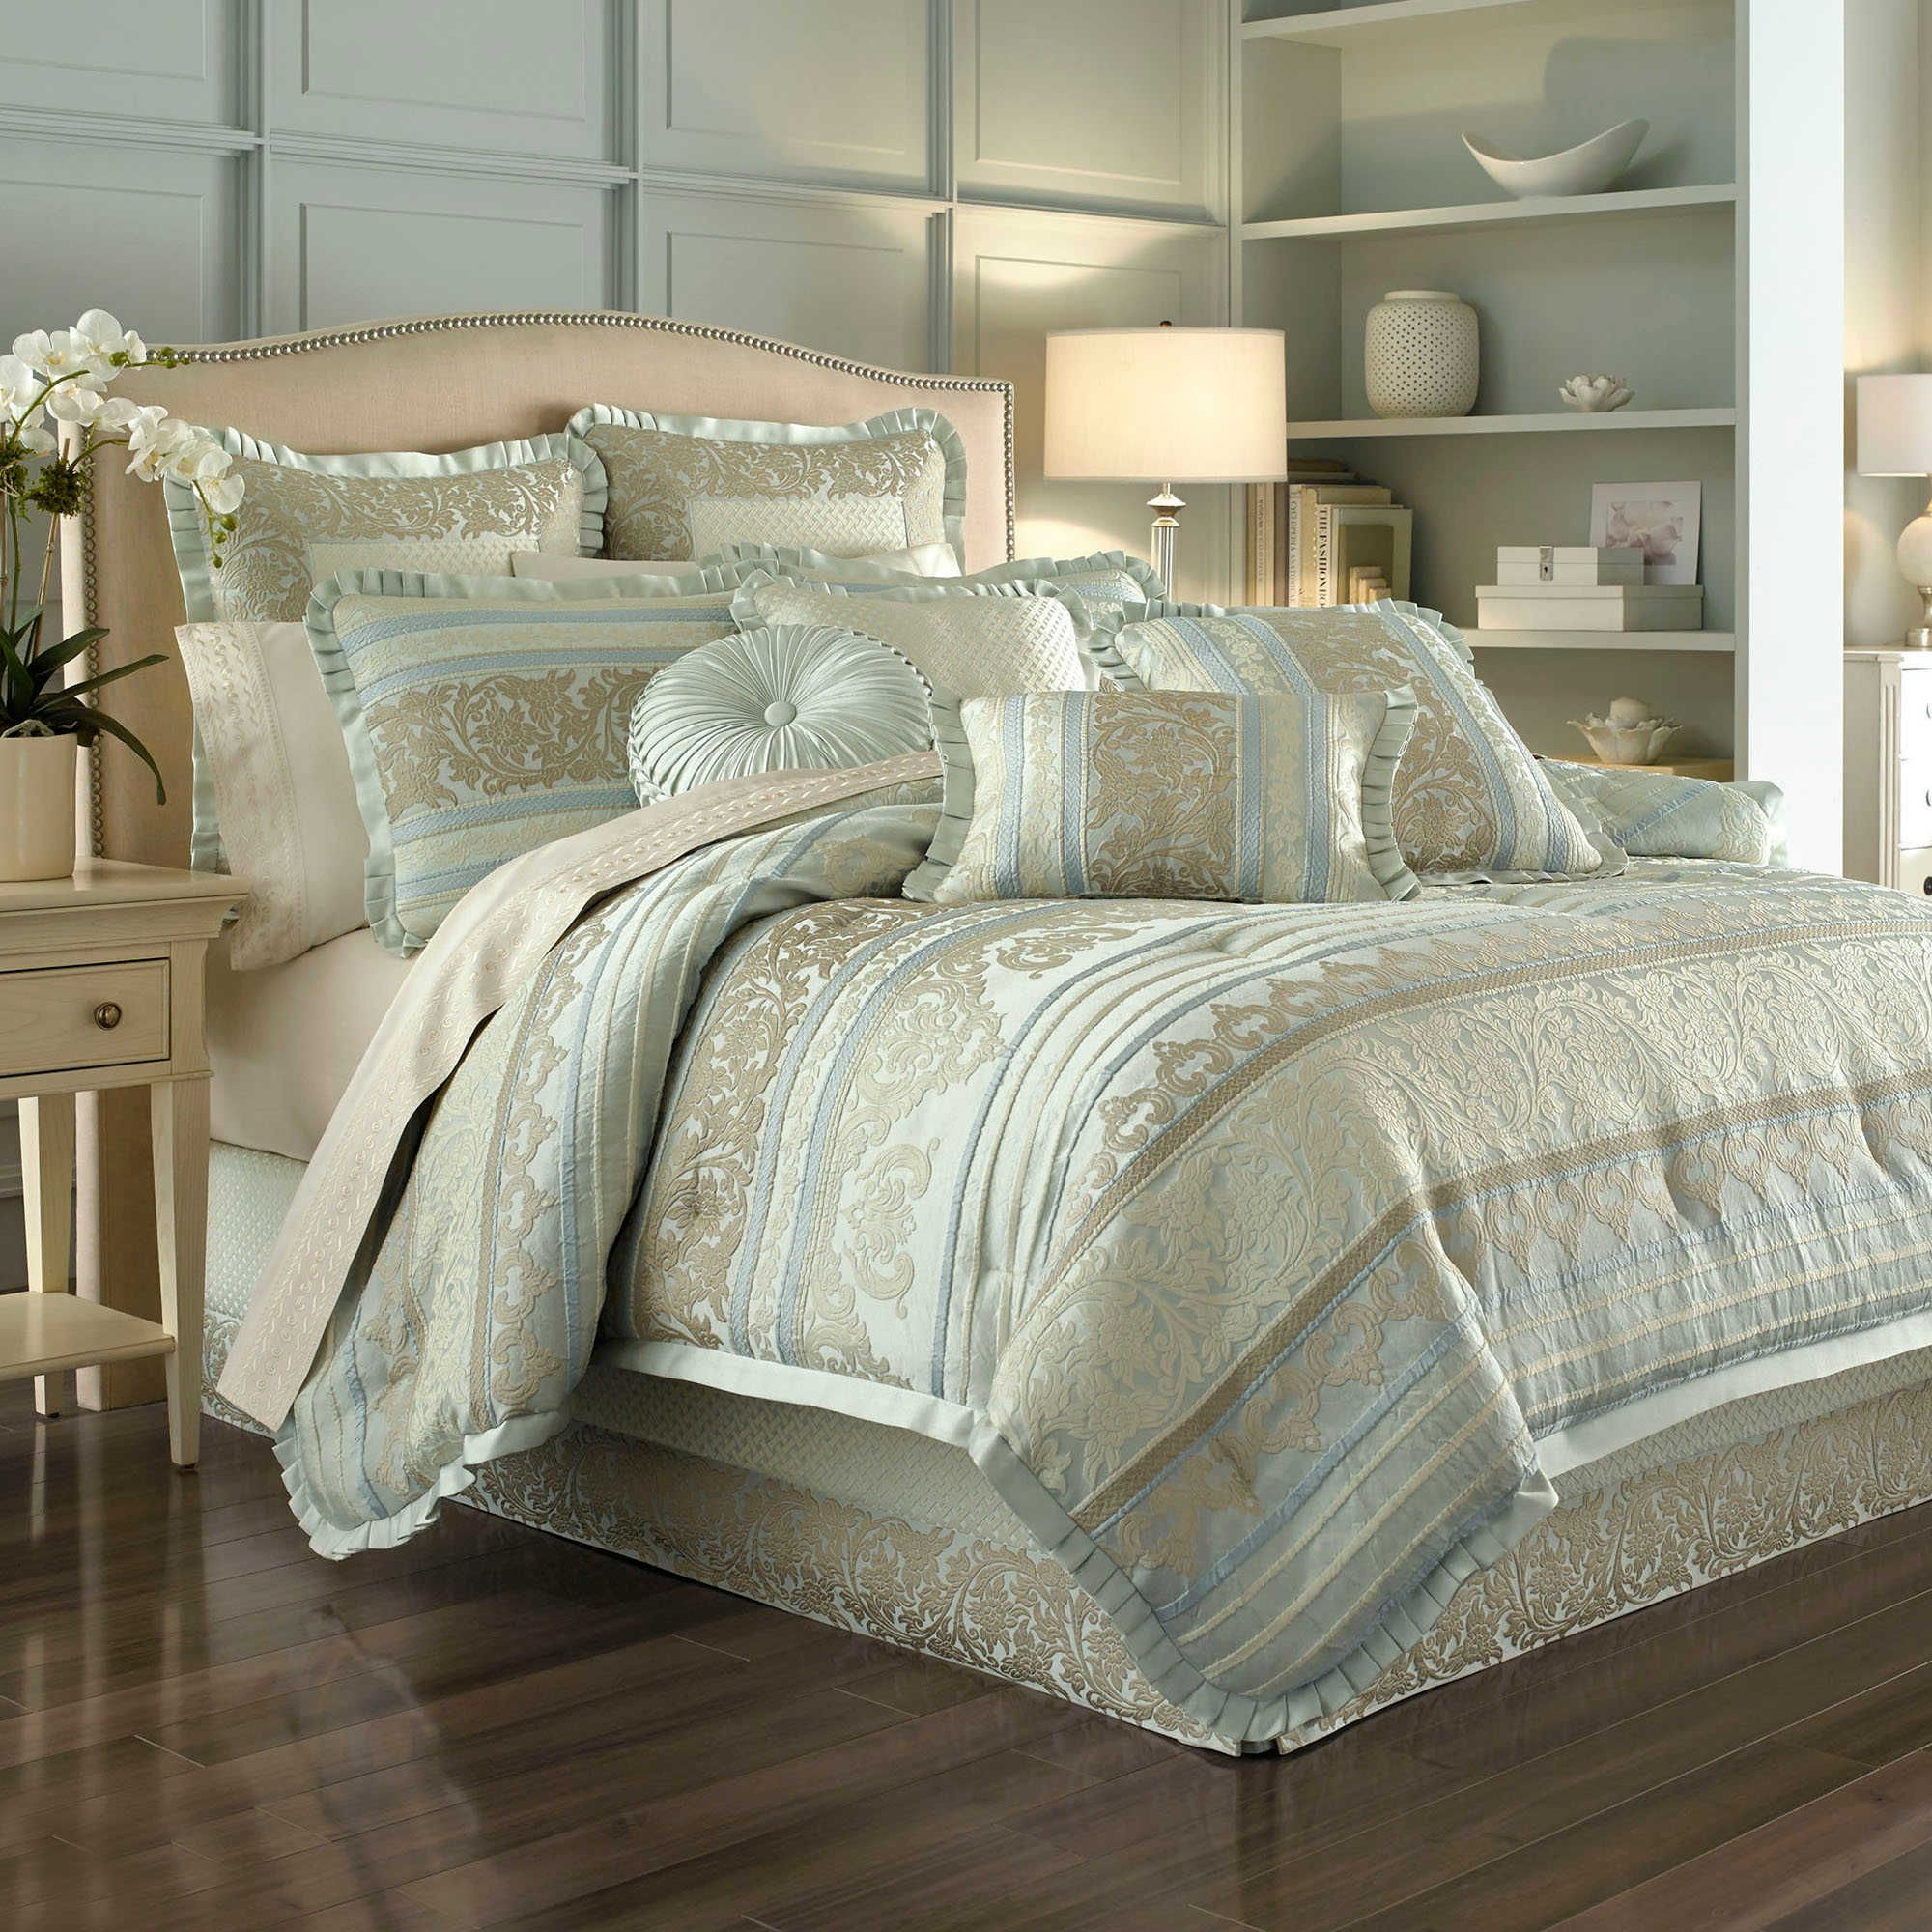 J. Queen New York™ Marcello Comforter Set in Ivory